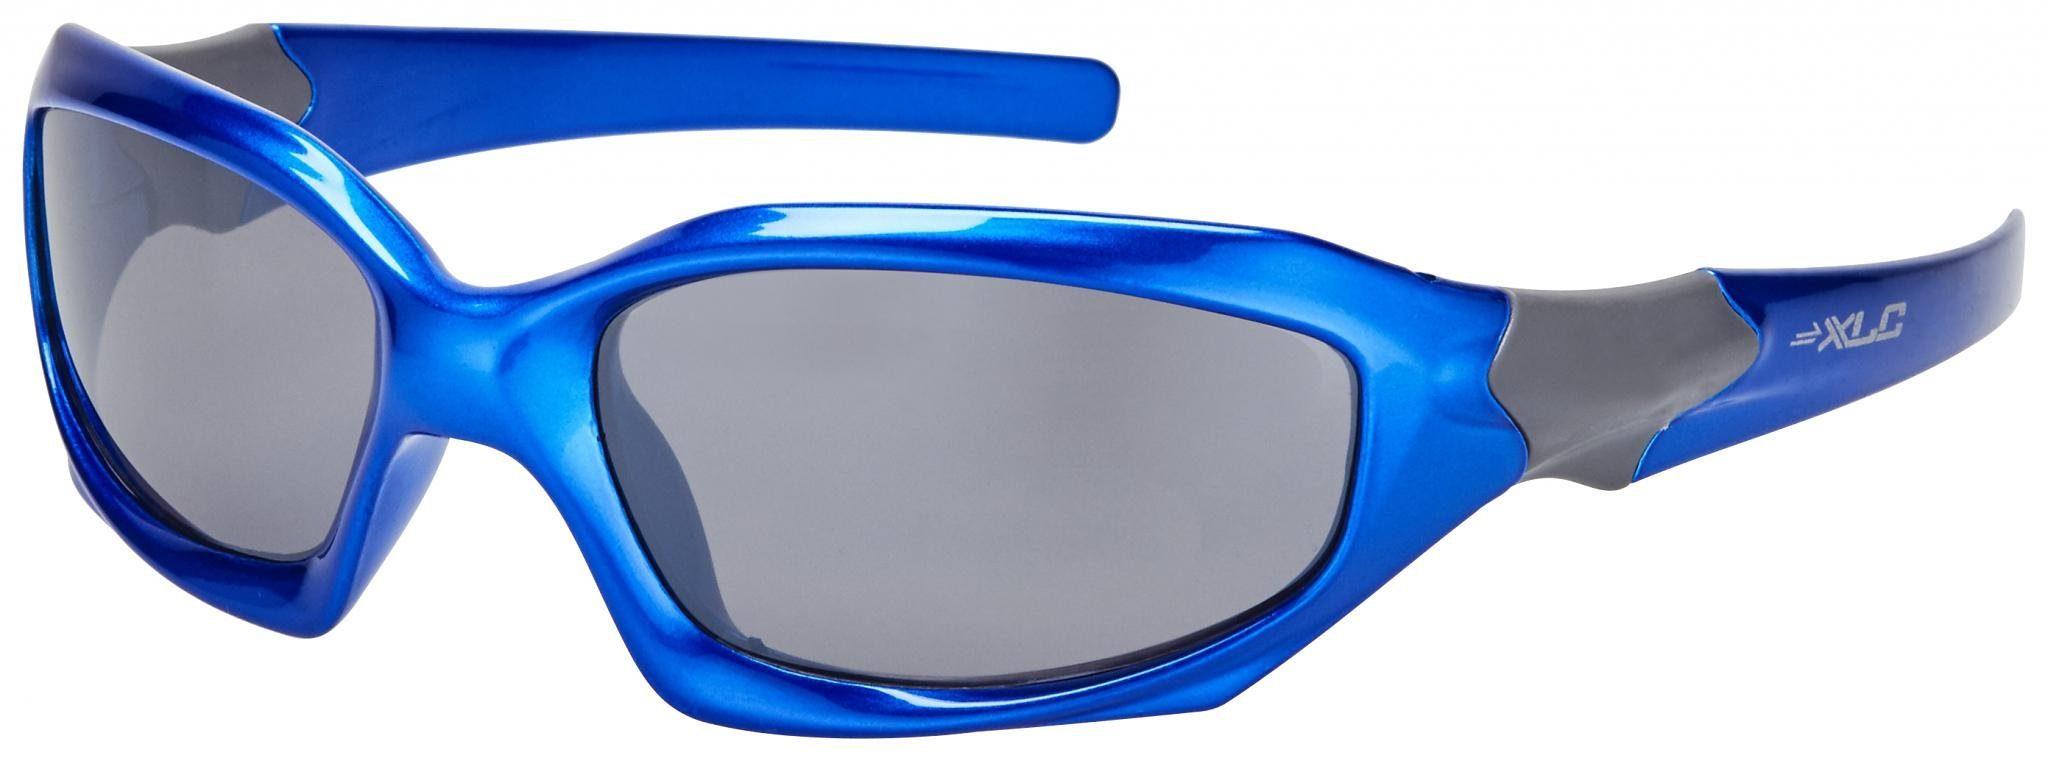 XLC Radsportbrille »Maui Sonnenbrille Kinder«